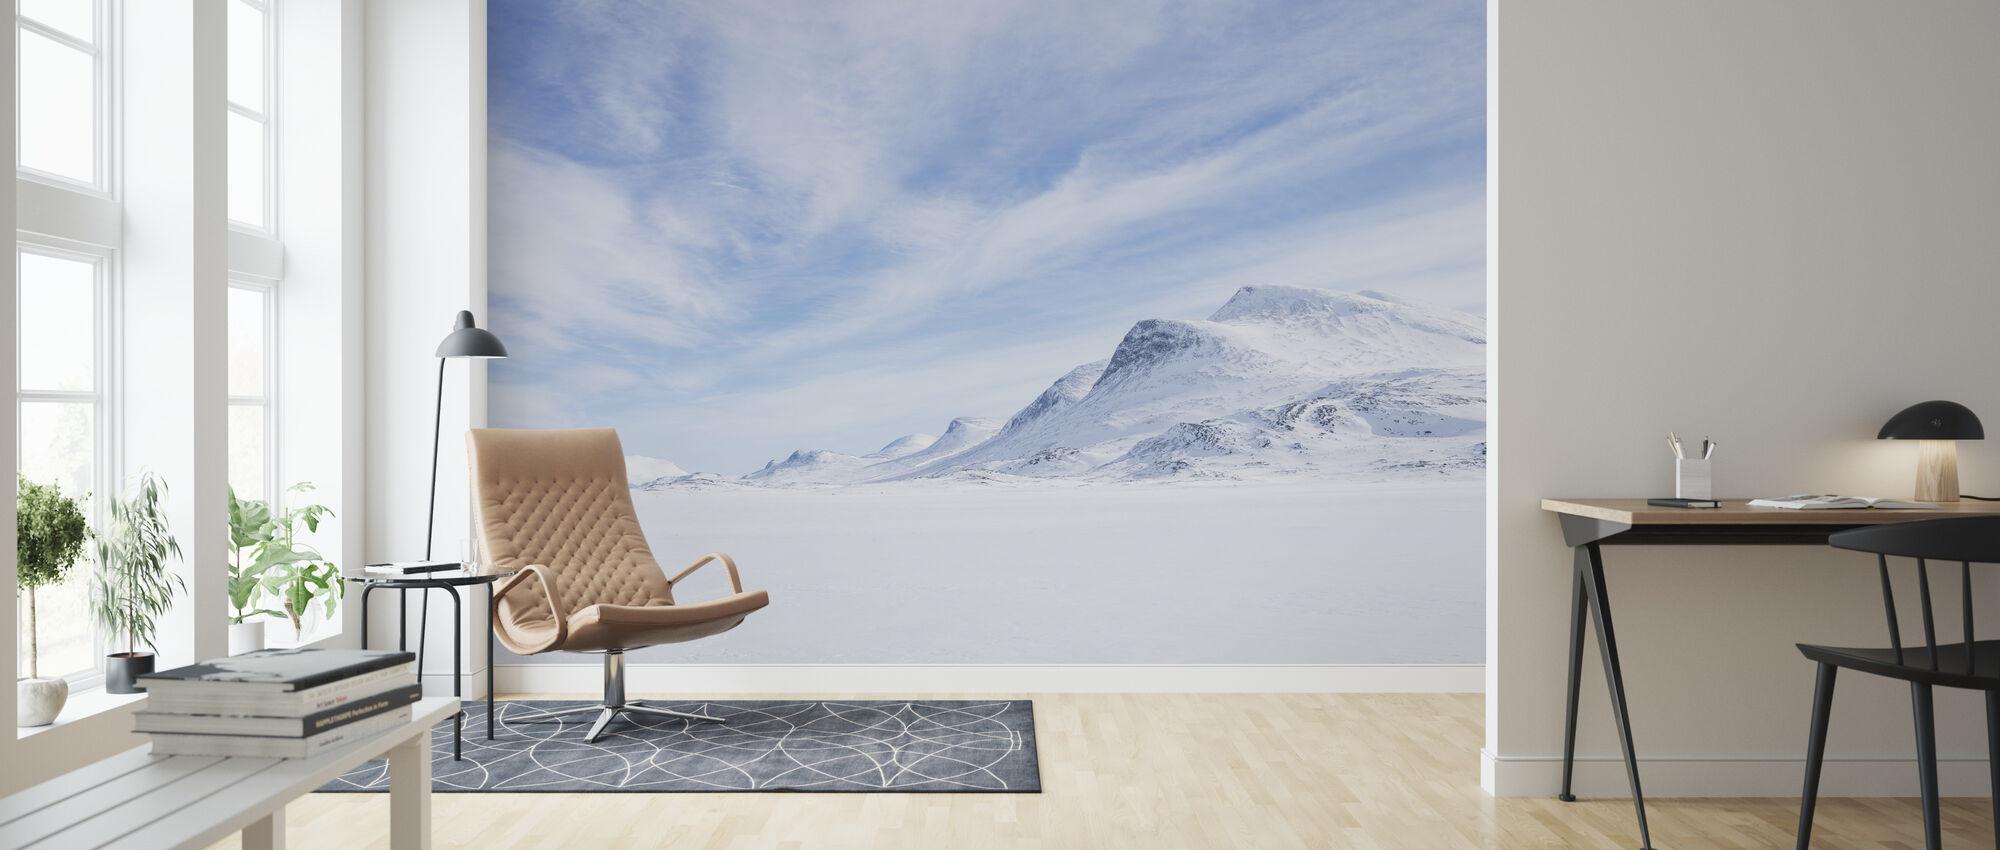 Winter Landscape in Swedish Lapland - Wallpaper - Living Room